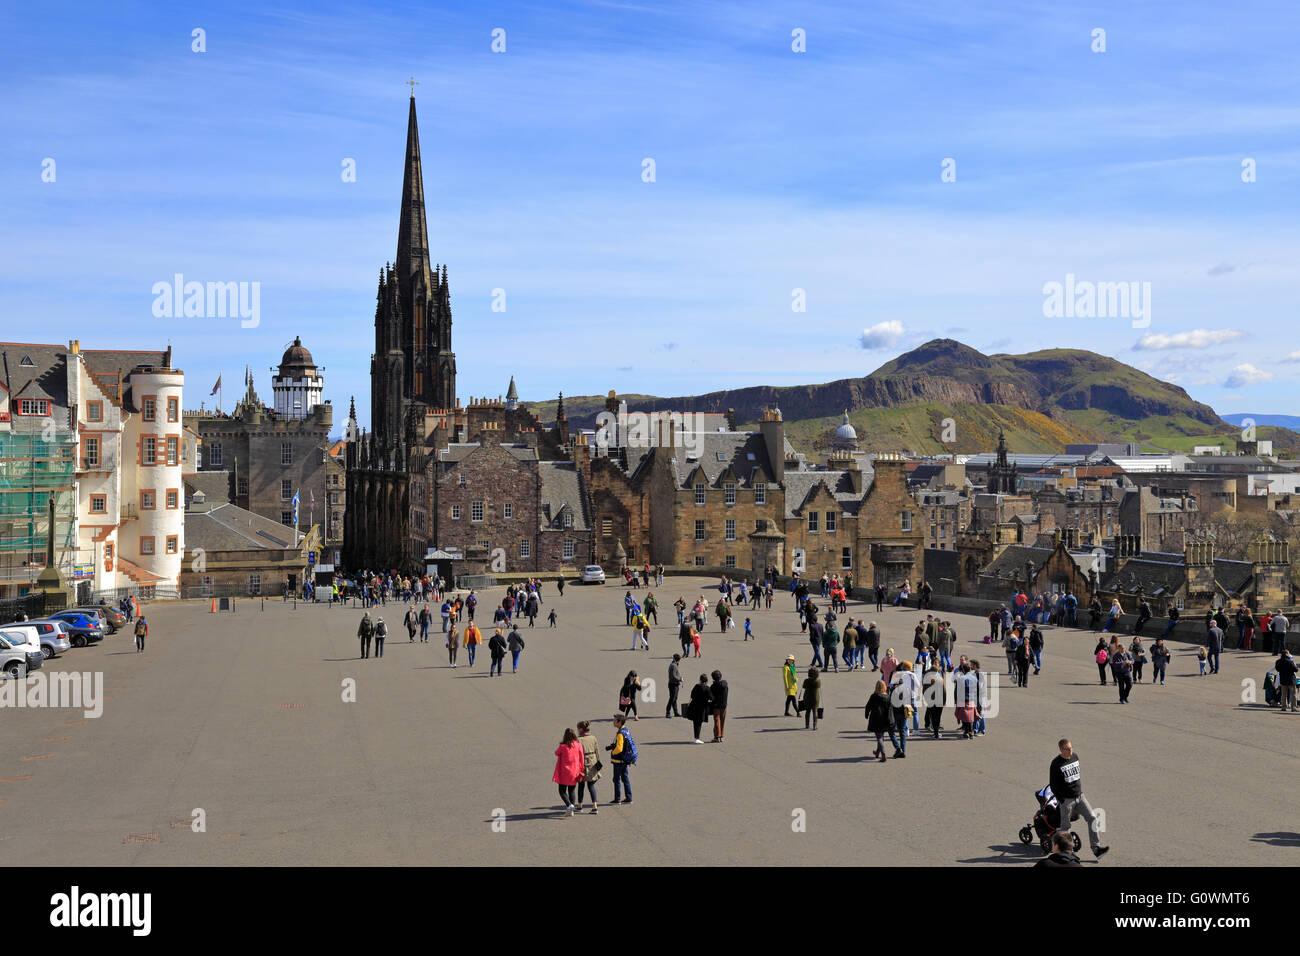 Visitors in the Castle Esplanade with Arthur's Seat in the distant, Edinburgh, Scotland, UK. Stock Photo